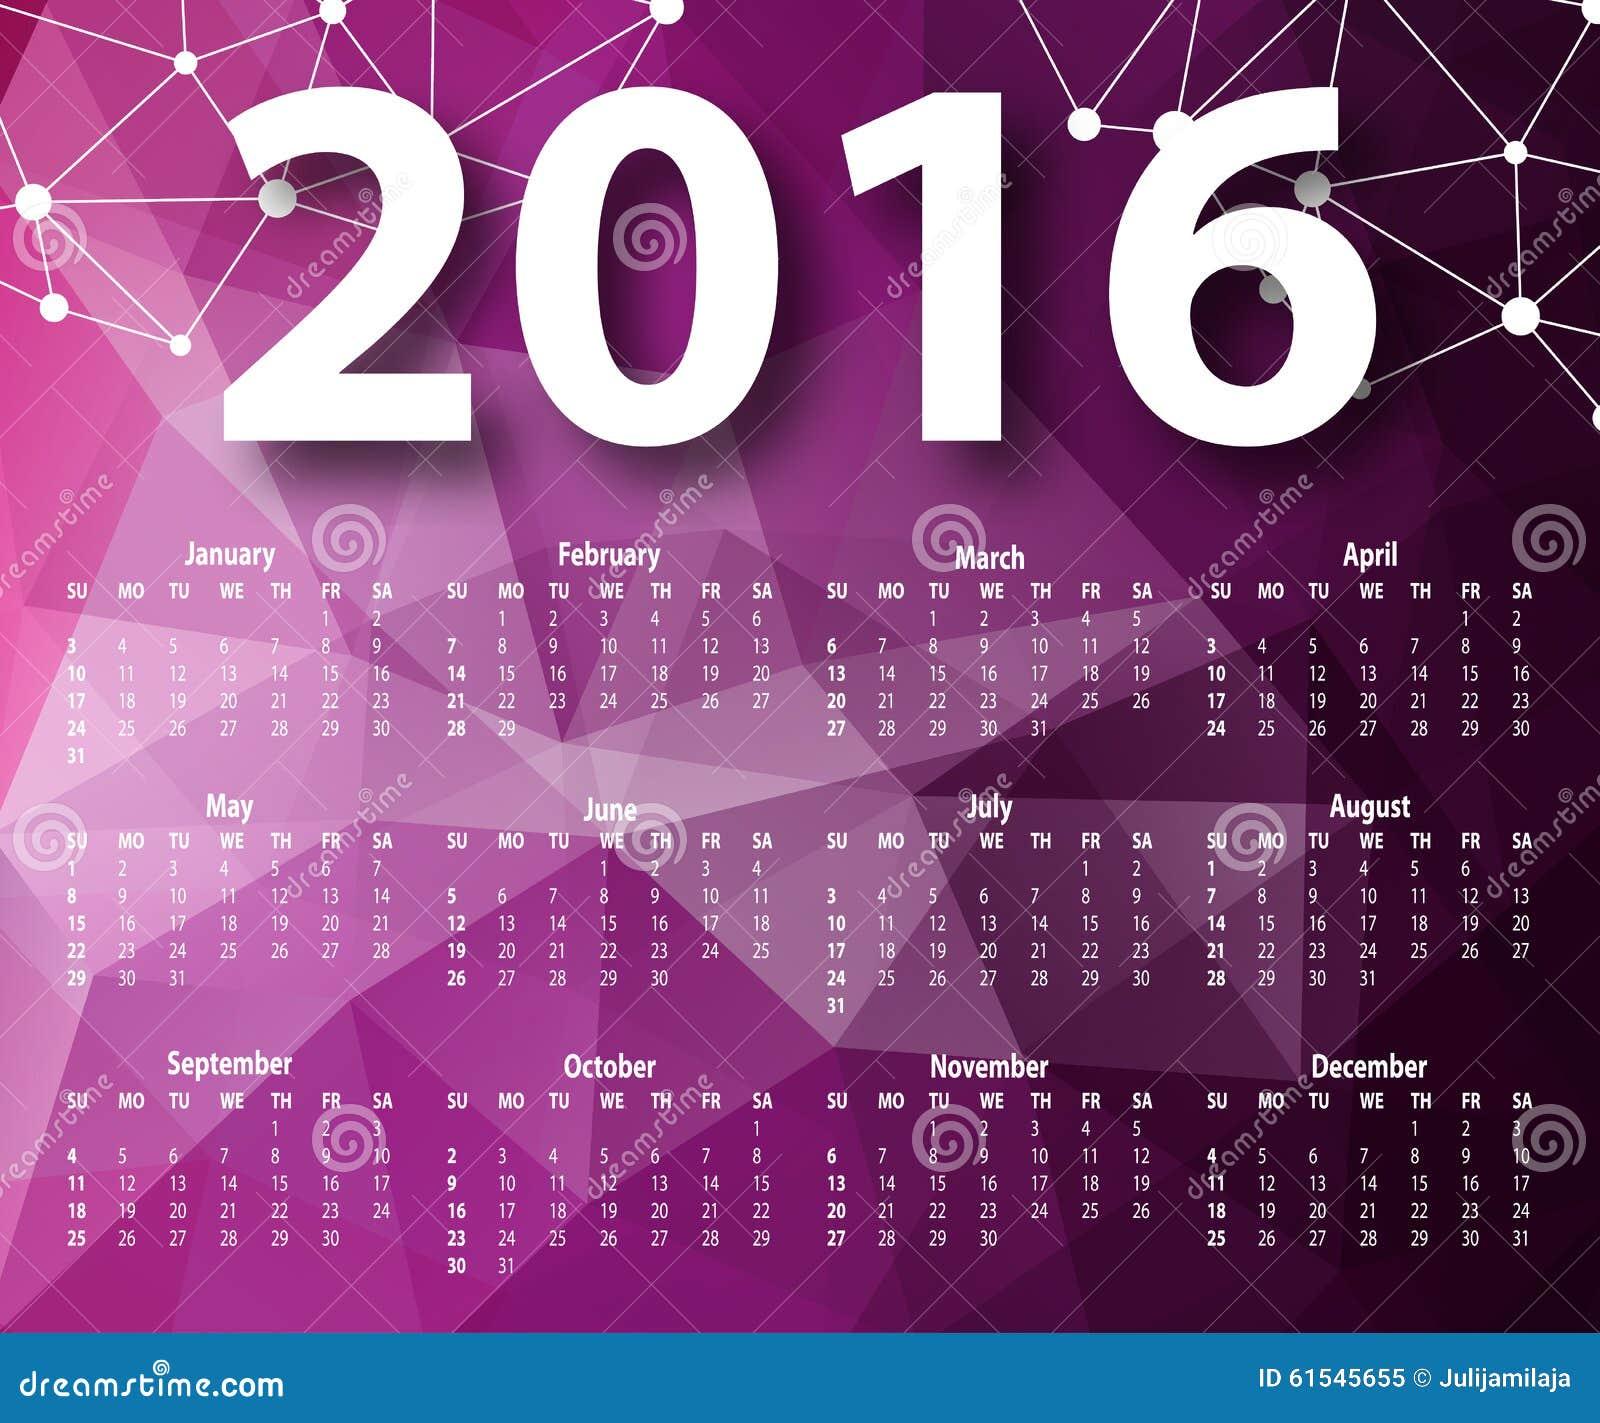 Calendar Design Elegant : Elegant template for calendar stock photo image